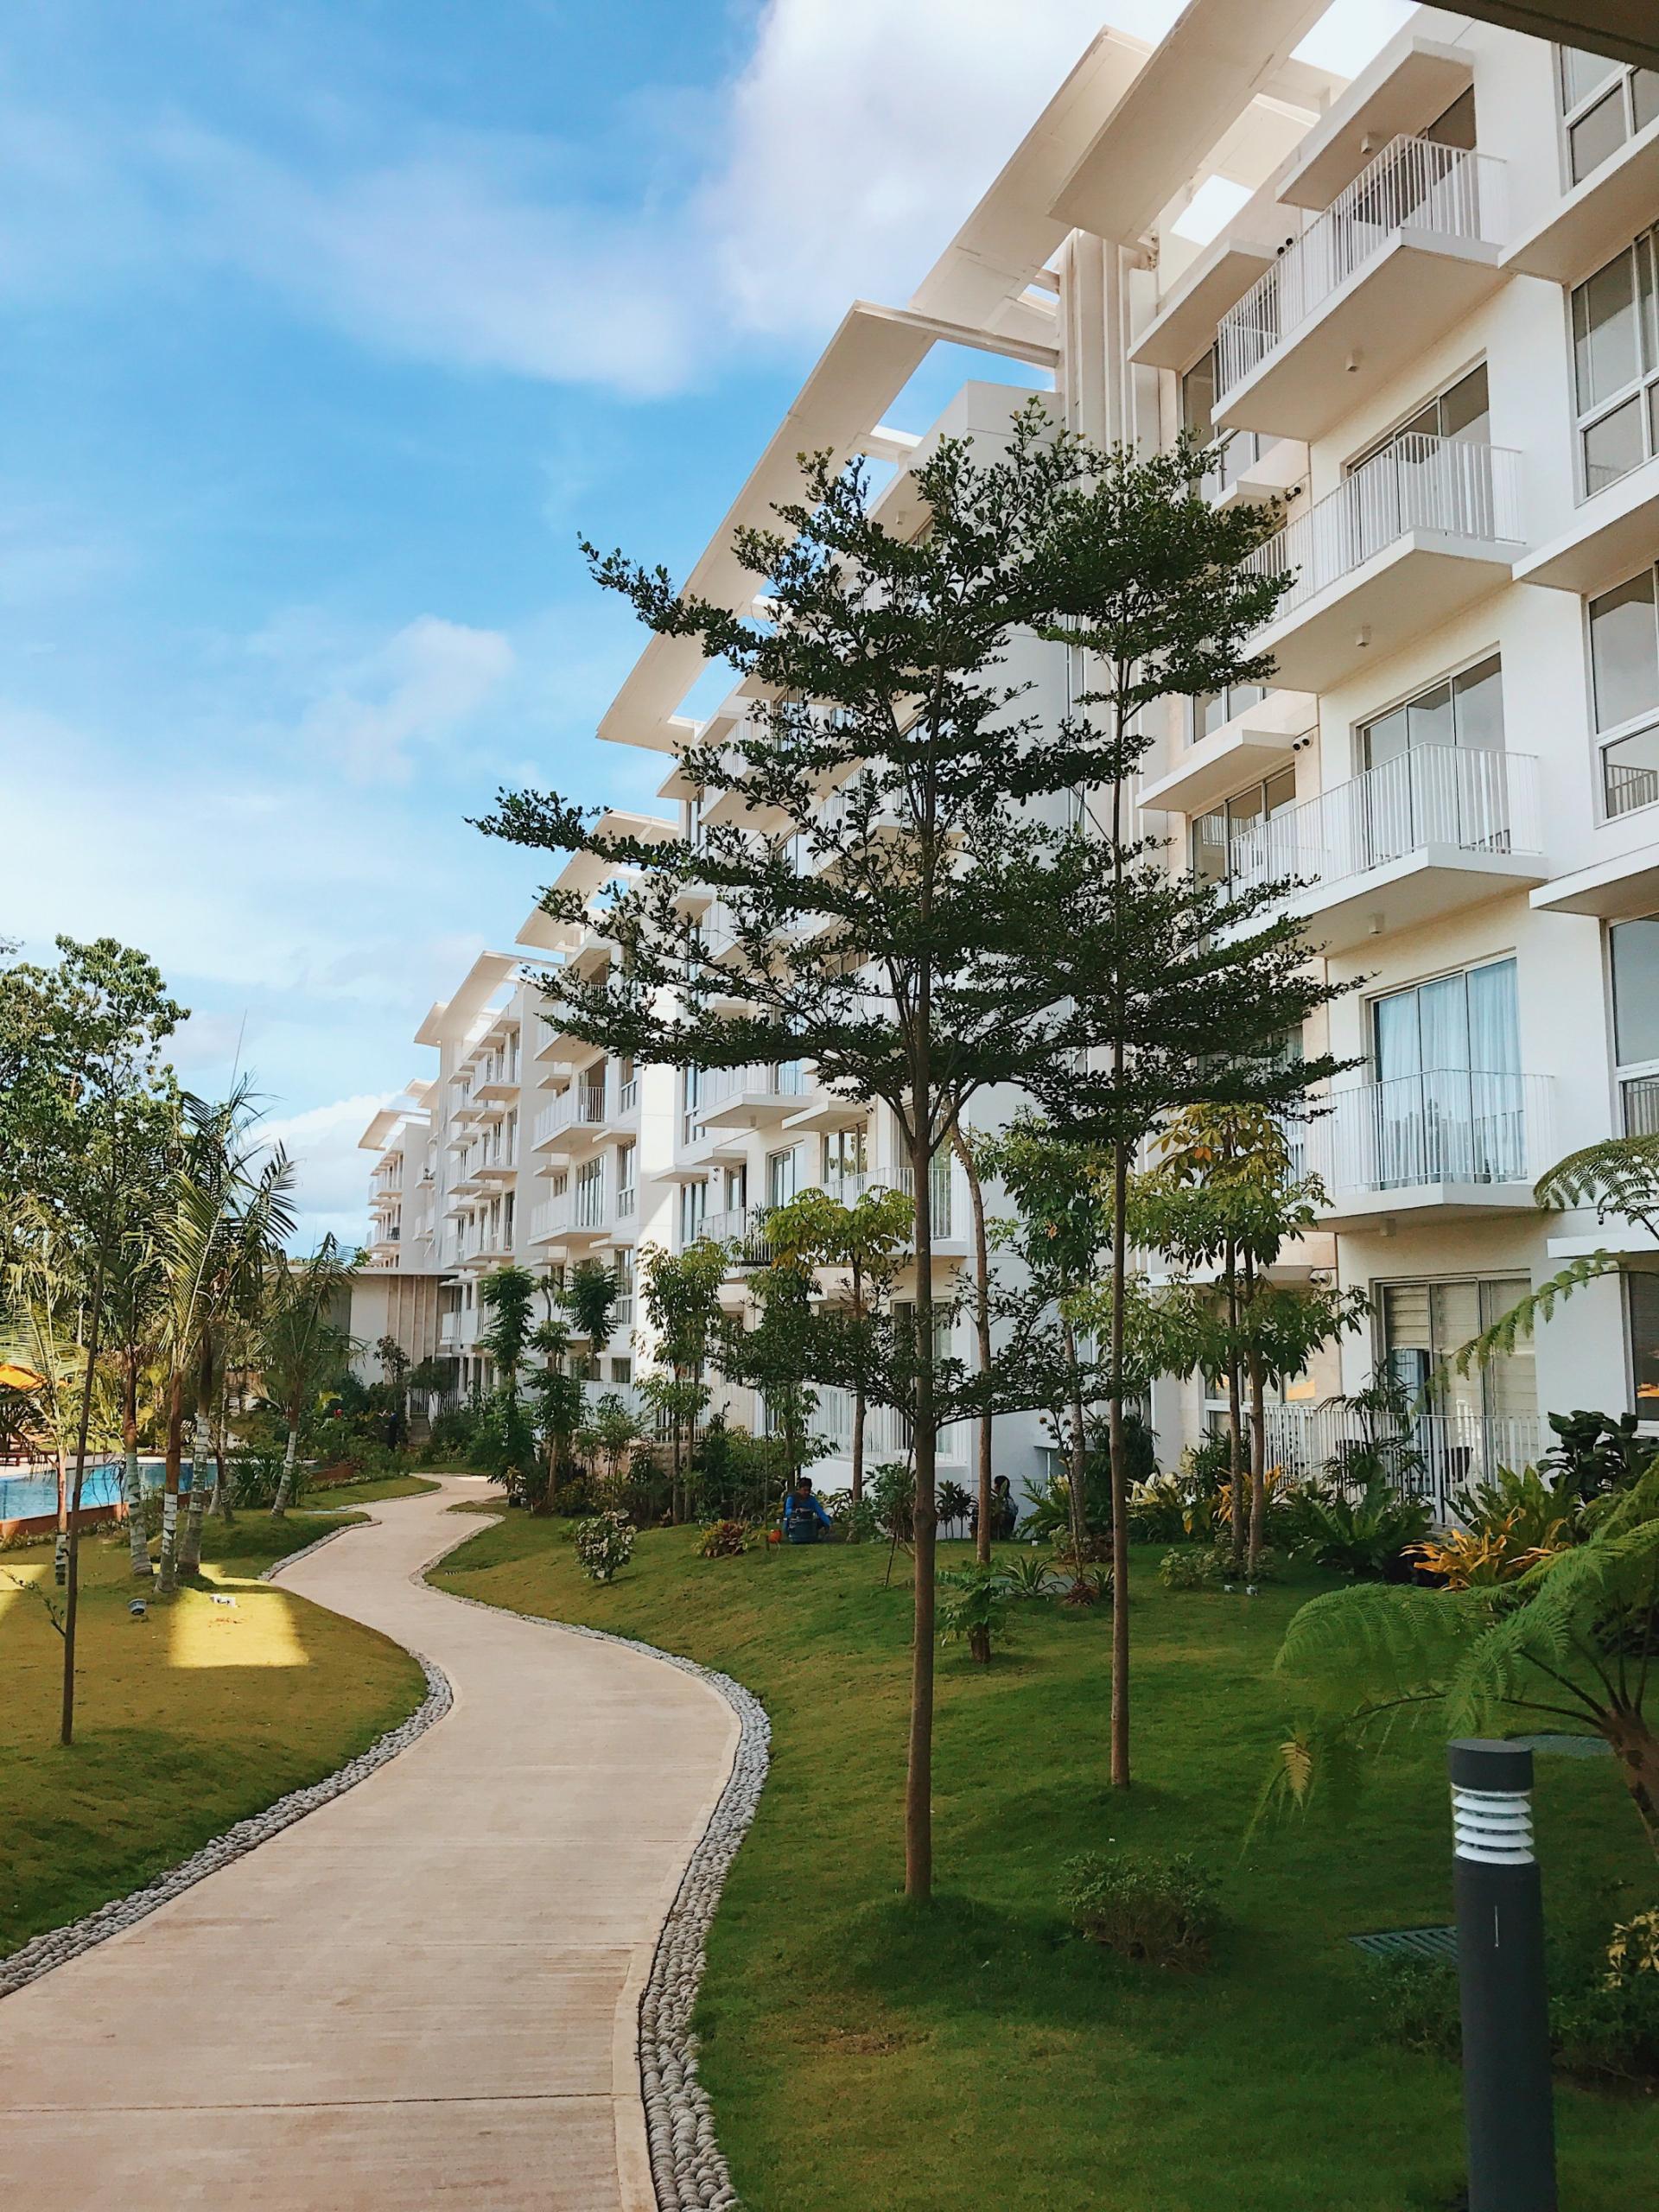 32 Sanson | outdoor building trees